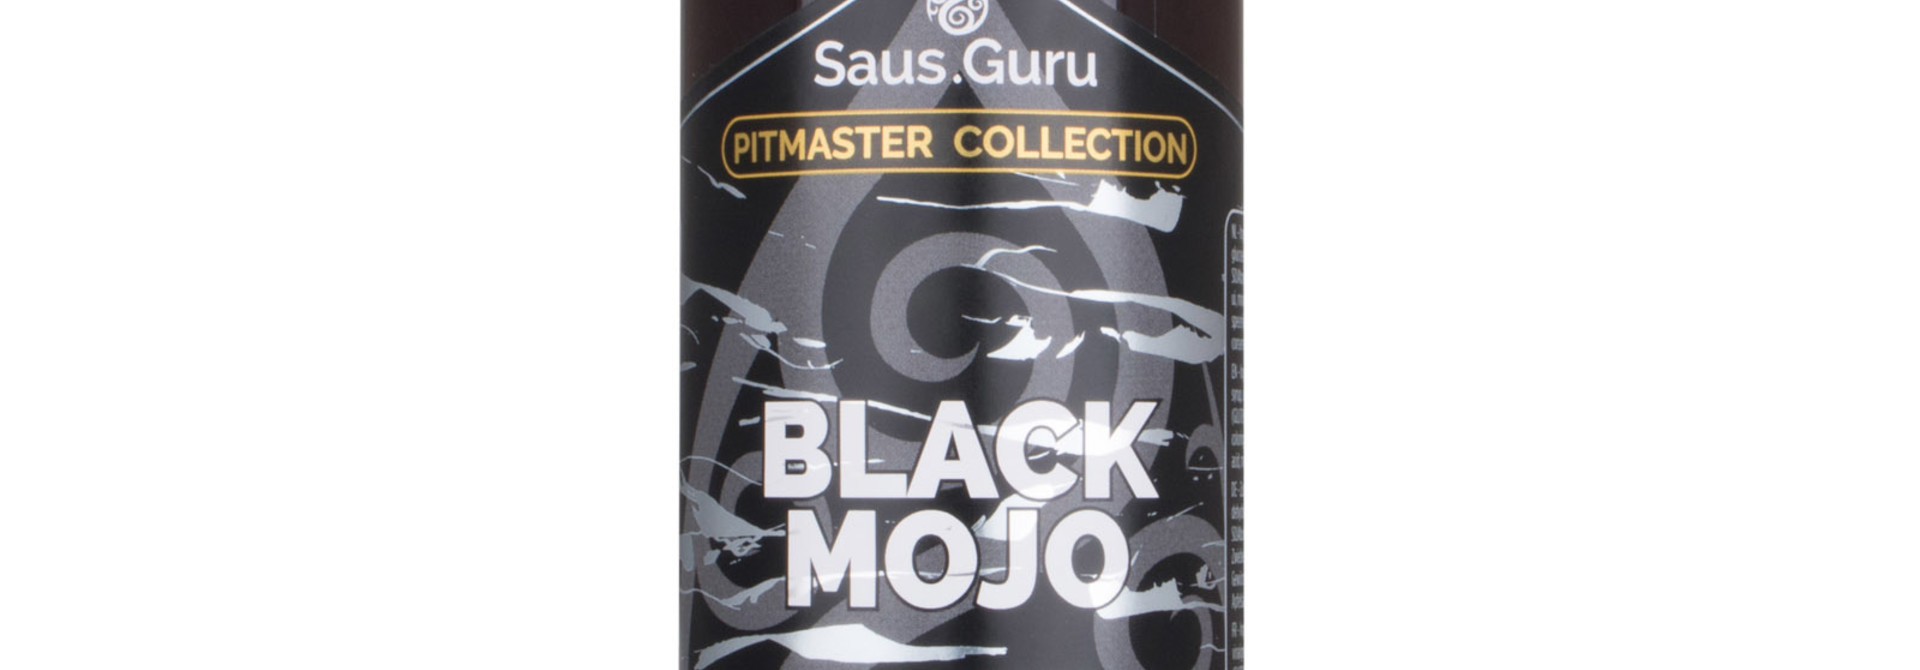 Saus.Guru's Black Mojo